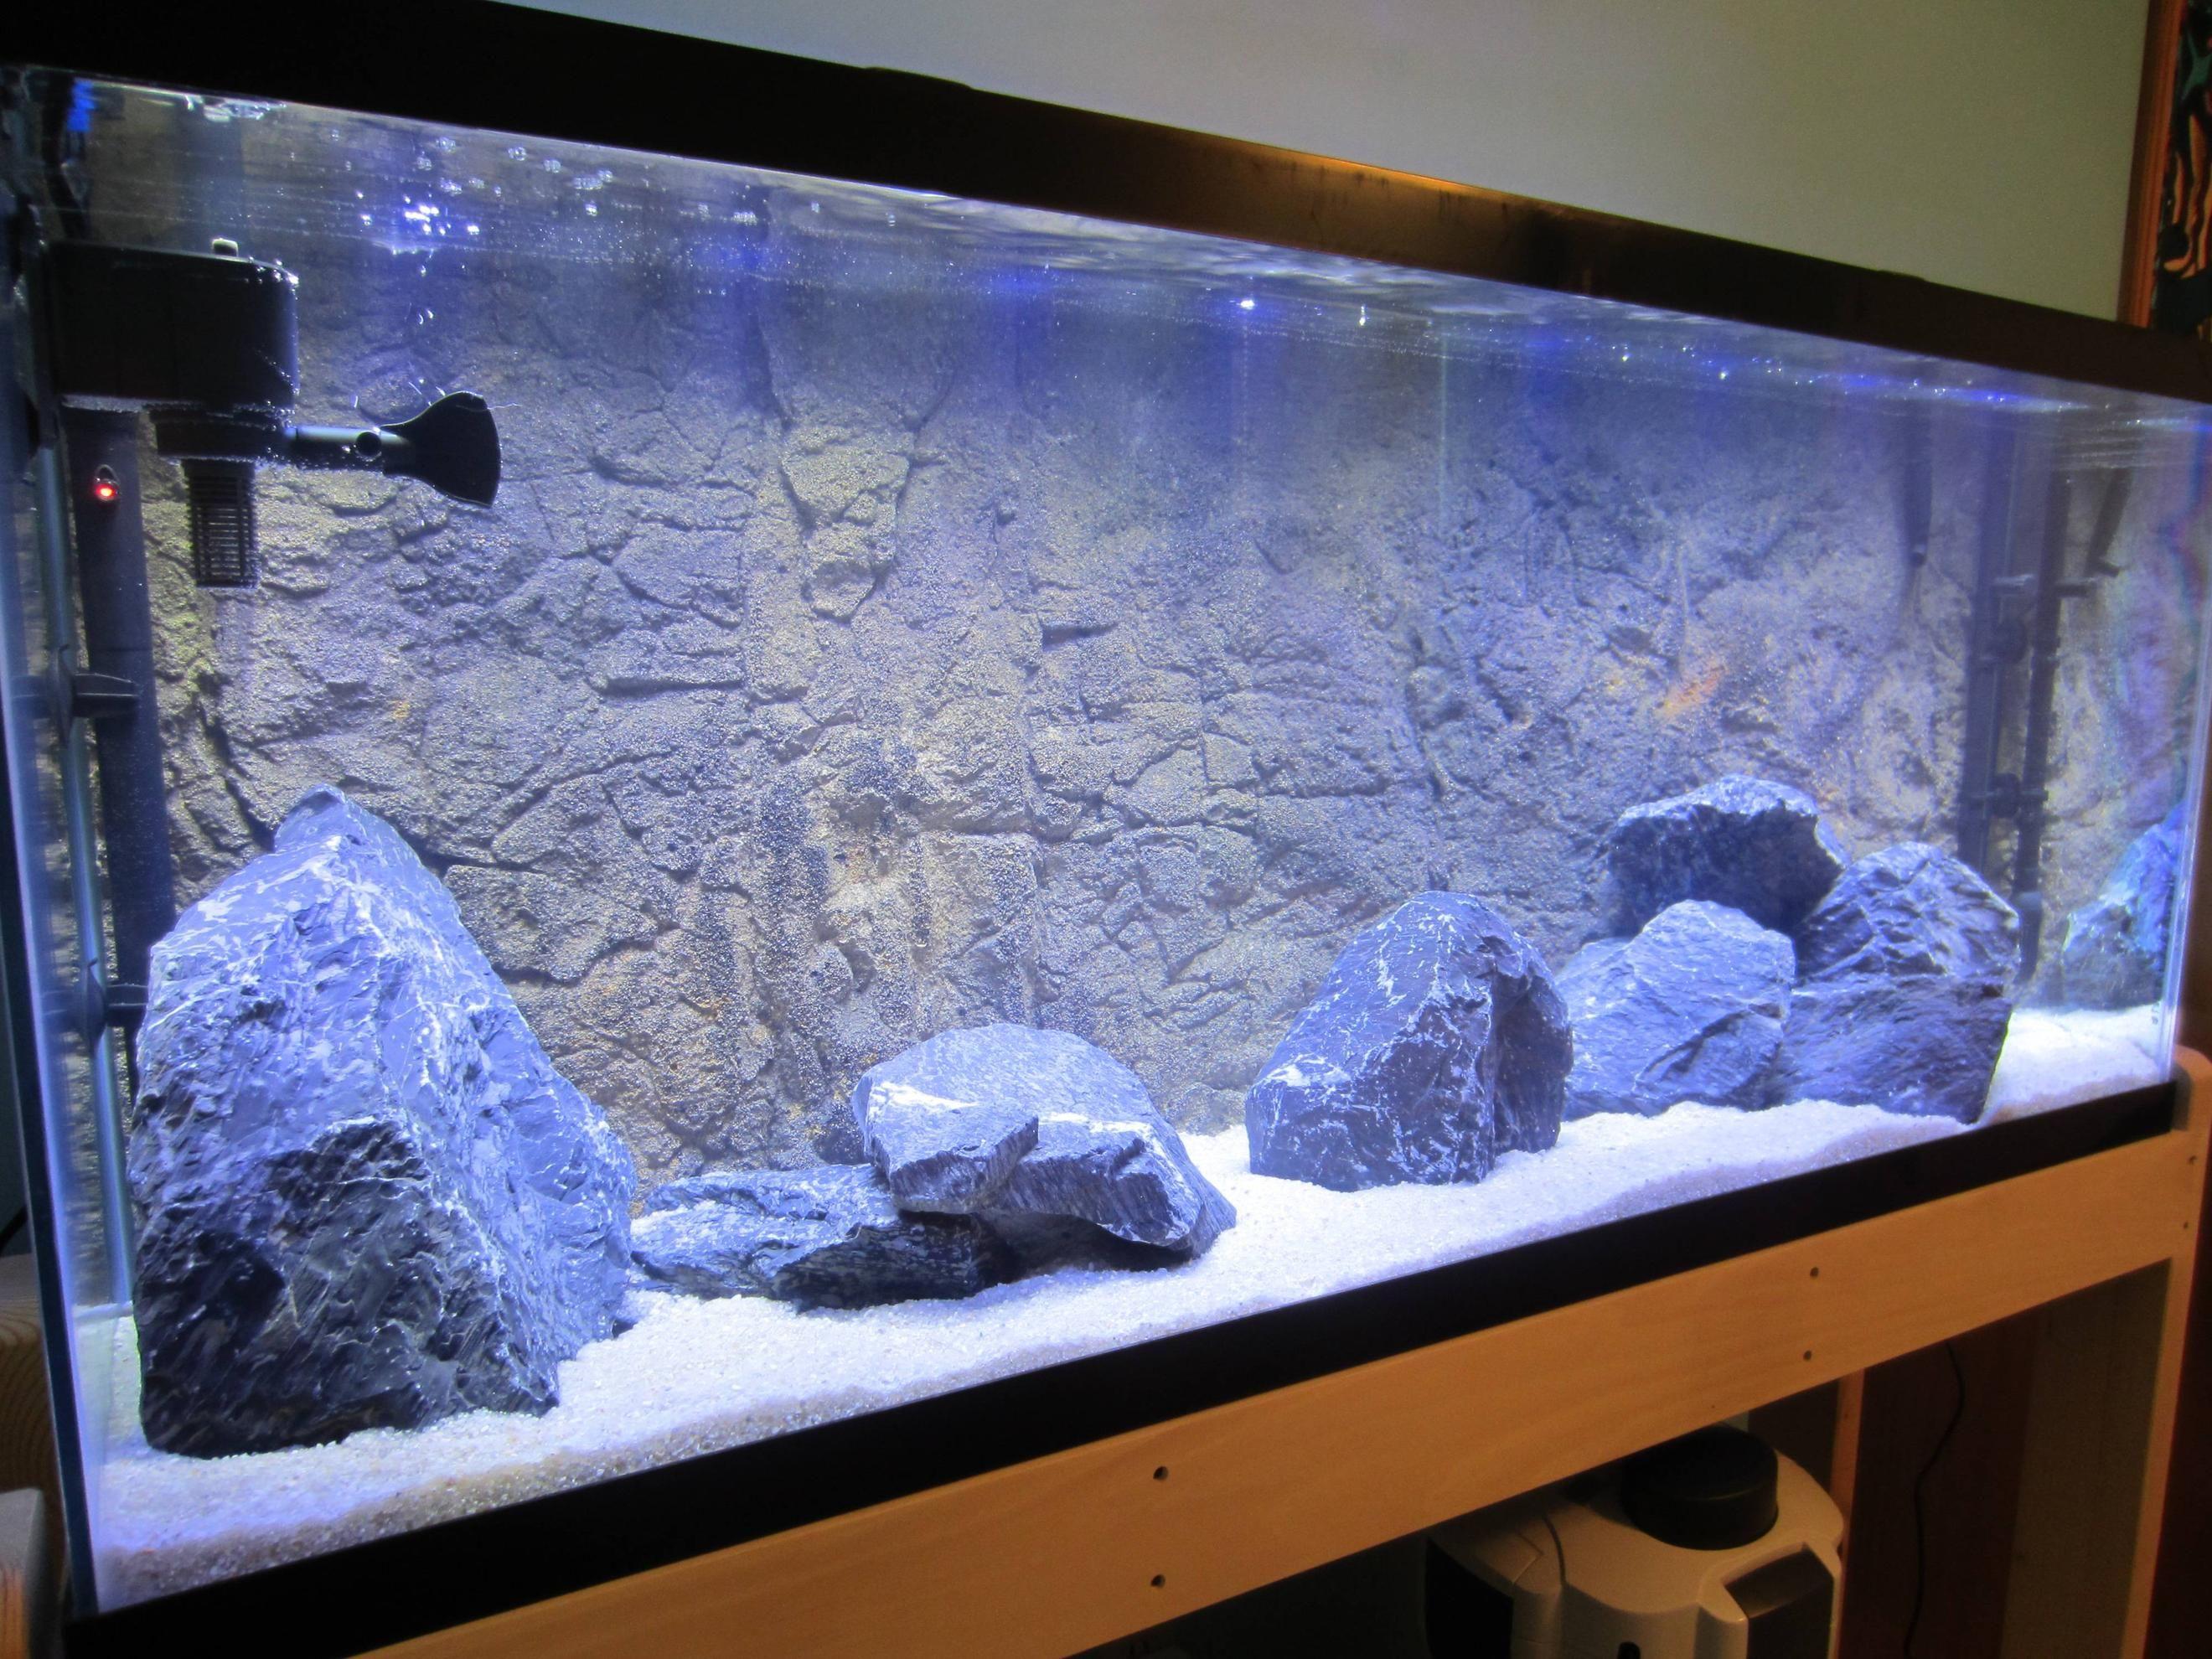 Universal Rocks Rocky Background Www Underwatereco Com Aquarium Backgrounds Best Water Filter Fresh Water Fish Tank